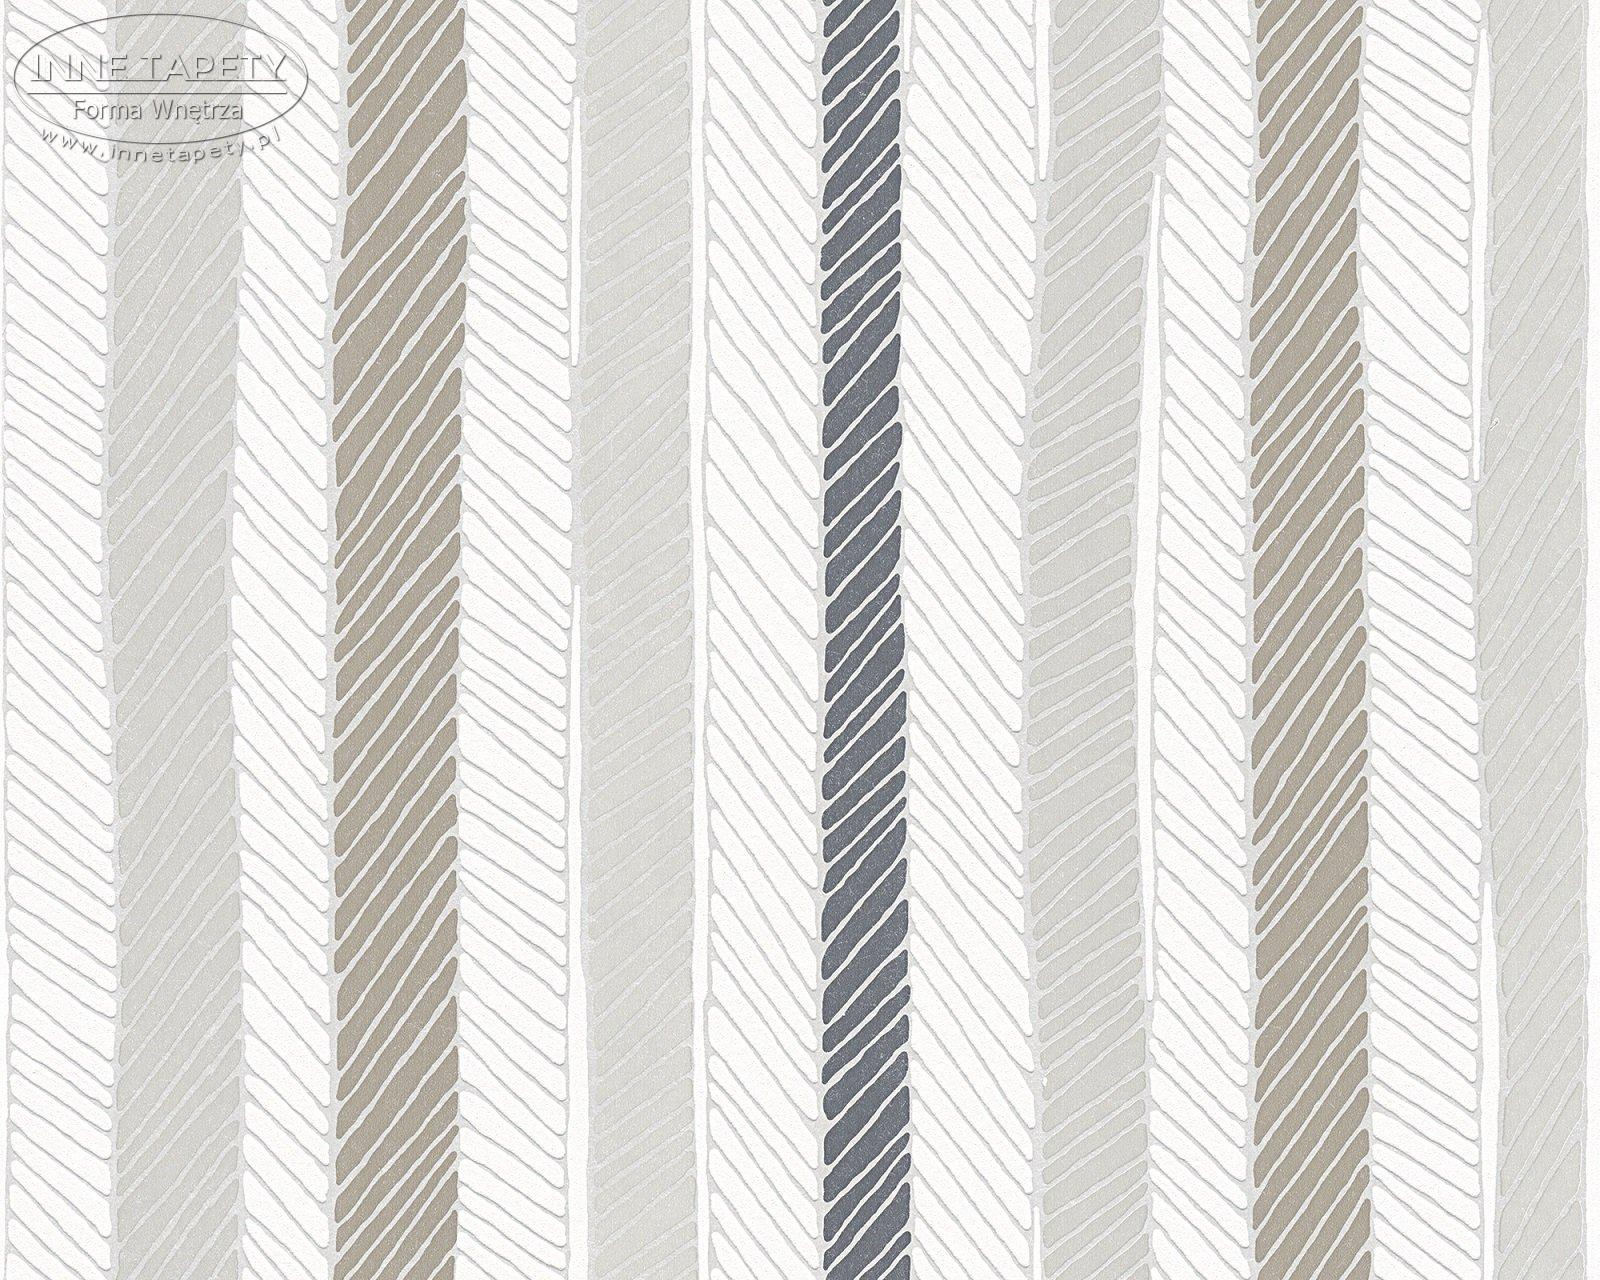 Carbonfaser Armlehnstuhl Design Luno: Armlehnstuhl Sway